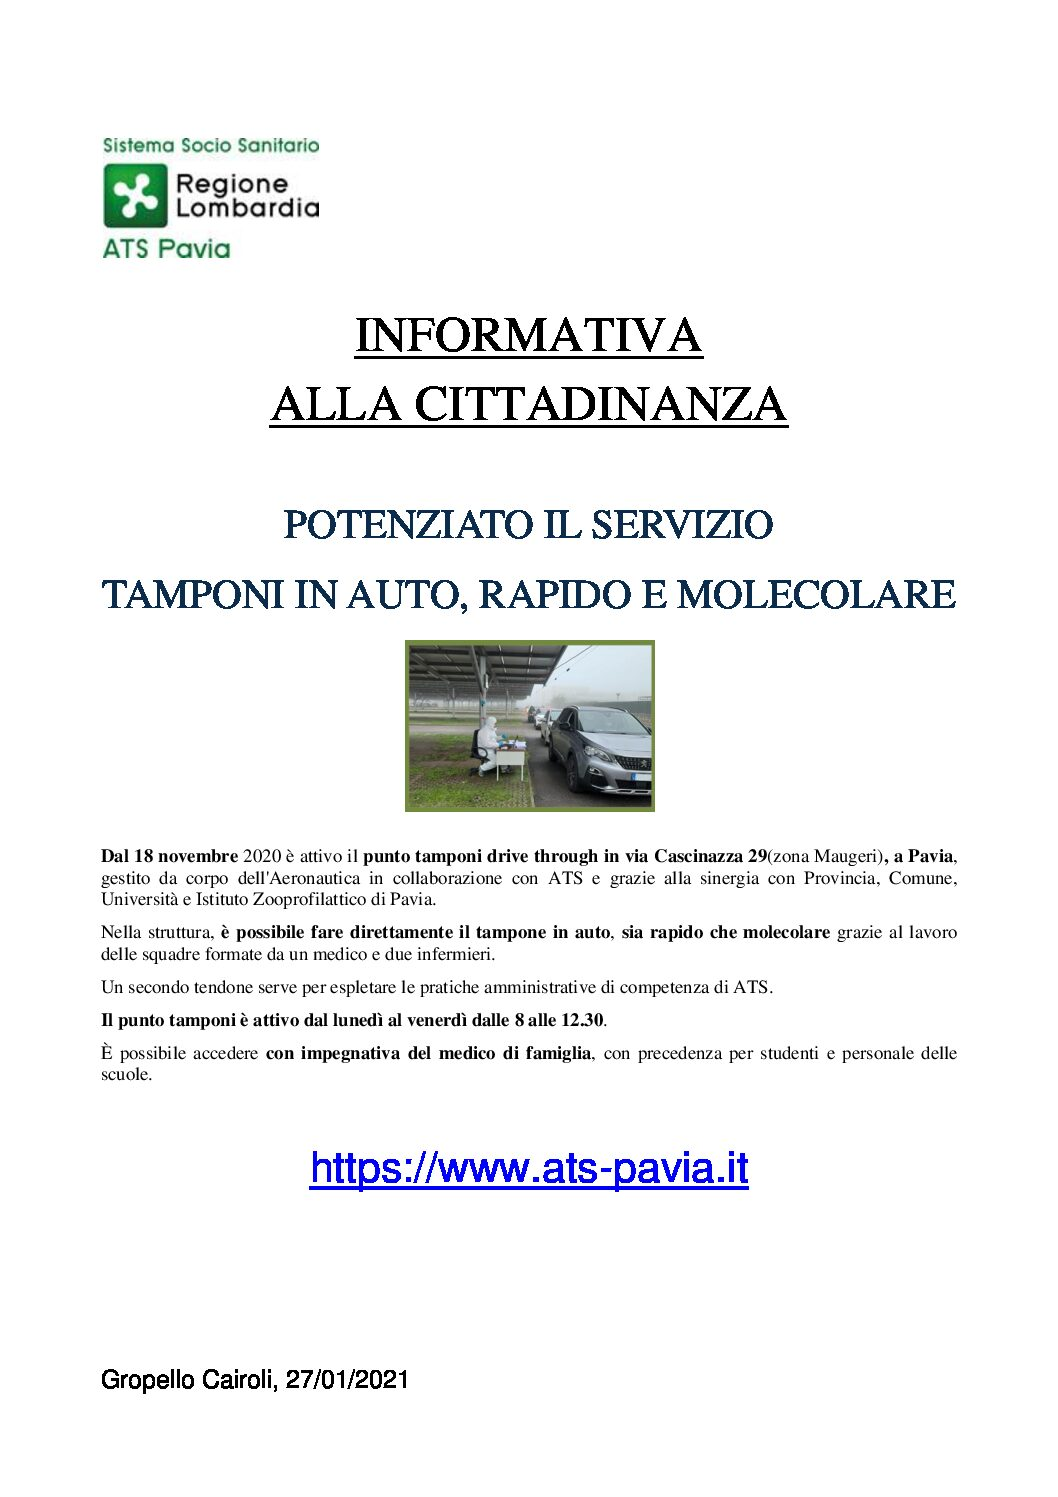 ATS: INFORMATIVA ALLA CITTADINANZA